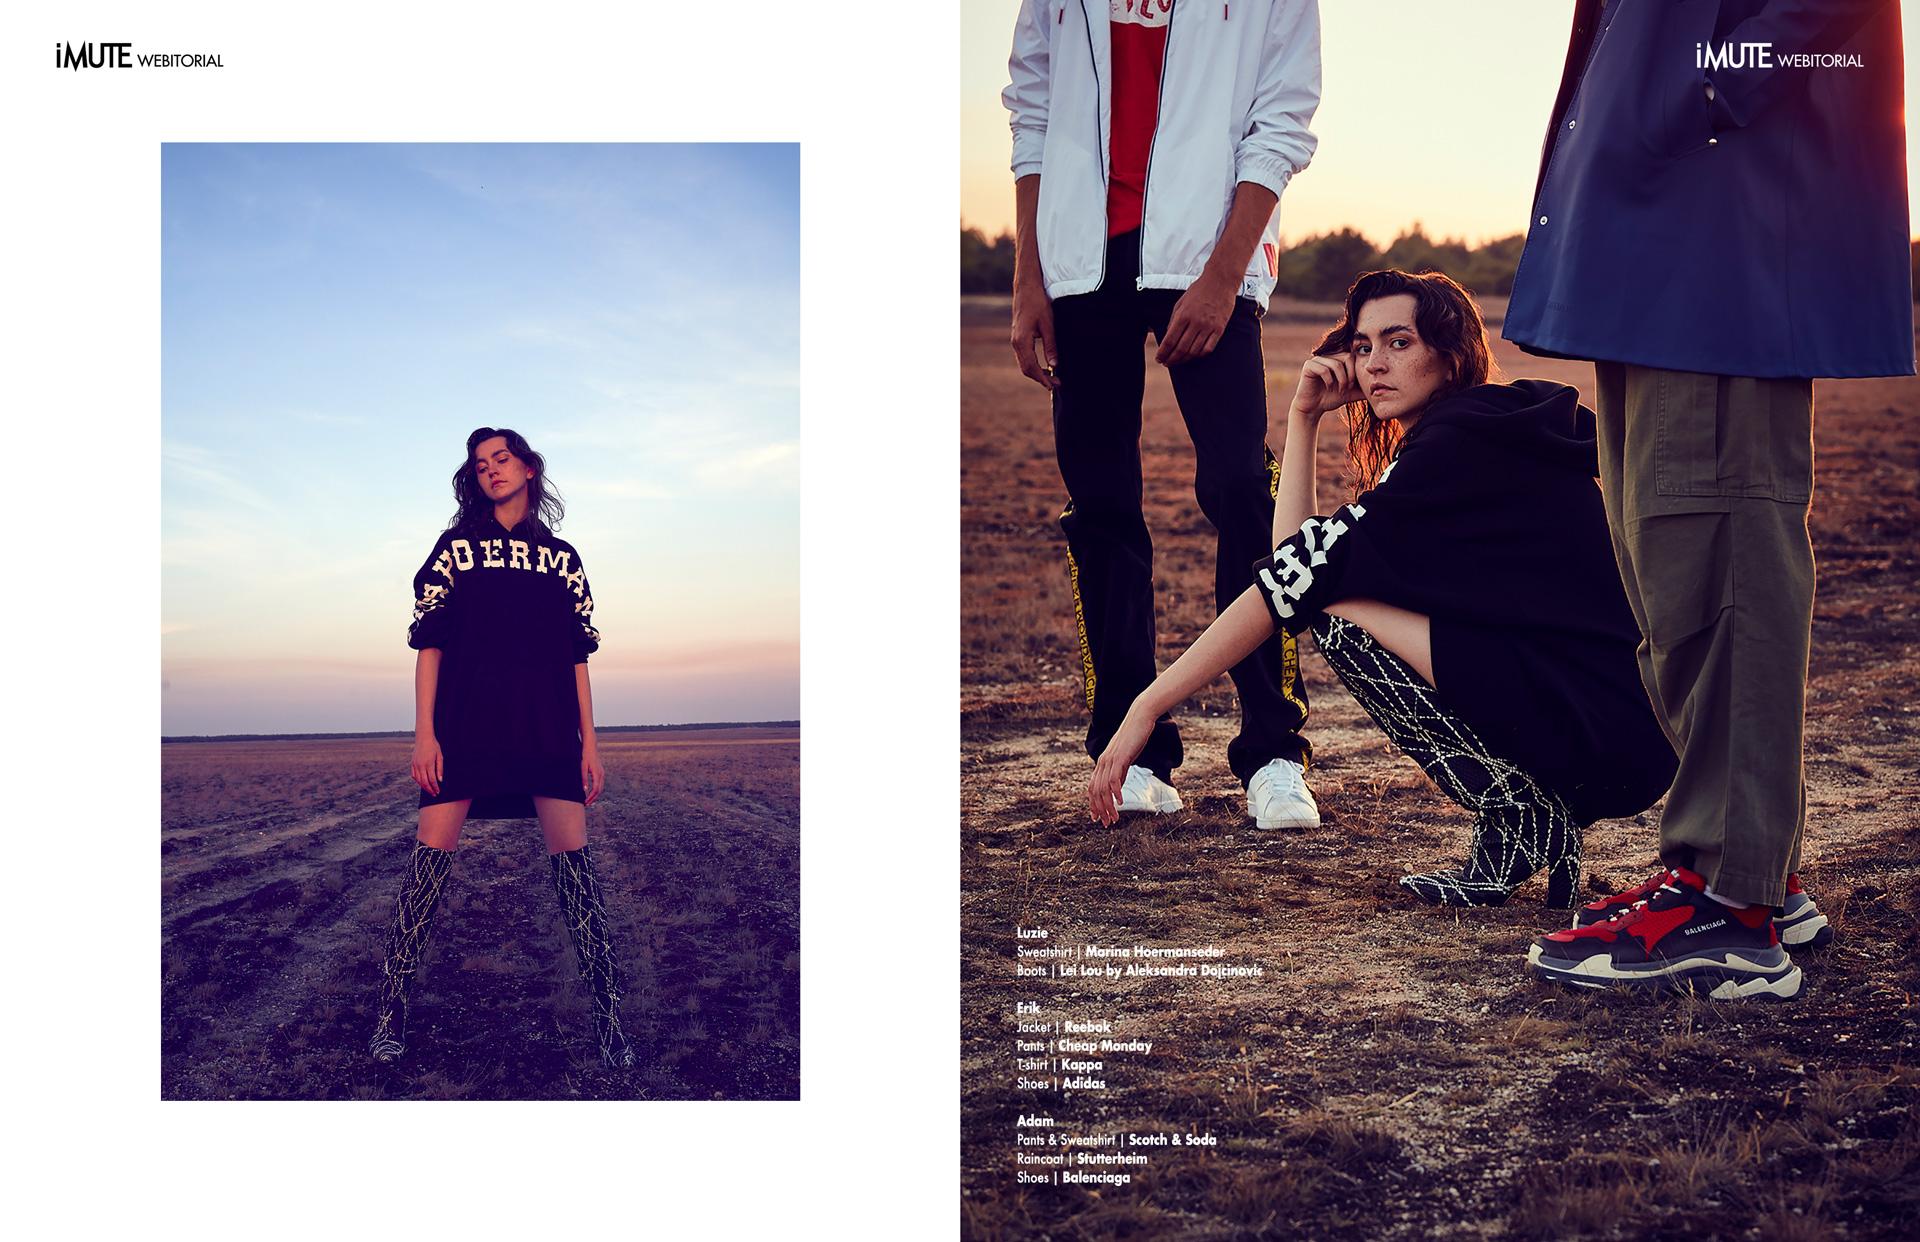 ESCAPING THE REAL WORLD webitorial for iMute Magazine Photographer|Sabrina Rynas Art Director|Christian Ruess Models| Luzie, Adam & Erik @Izaio Management Stylist|Davor Jelusic Makeup & Hair|Wiebke Reich